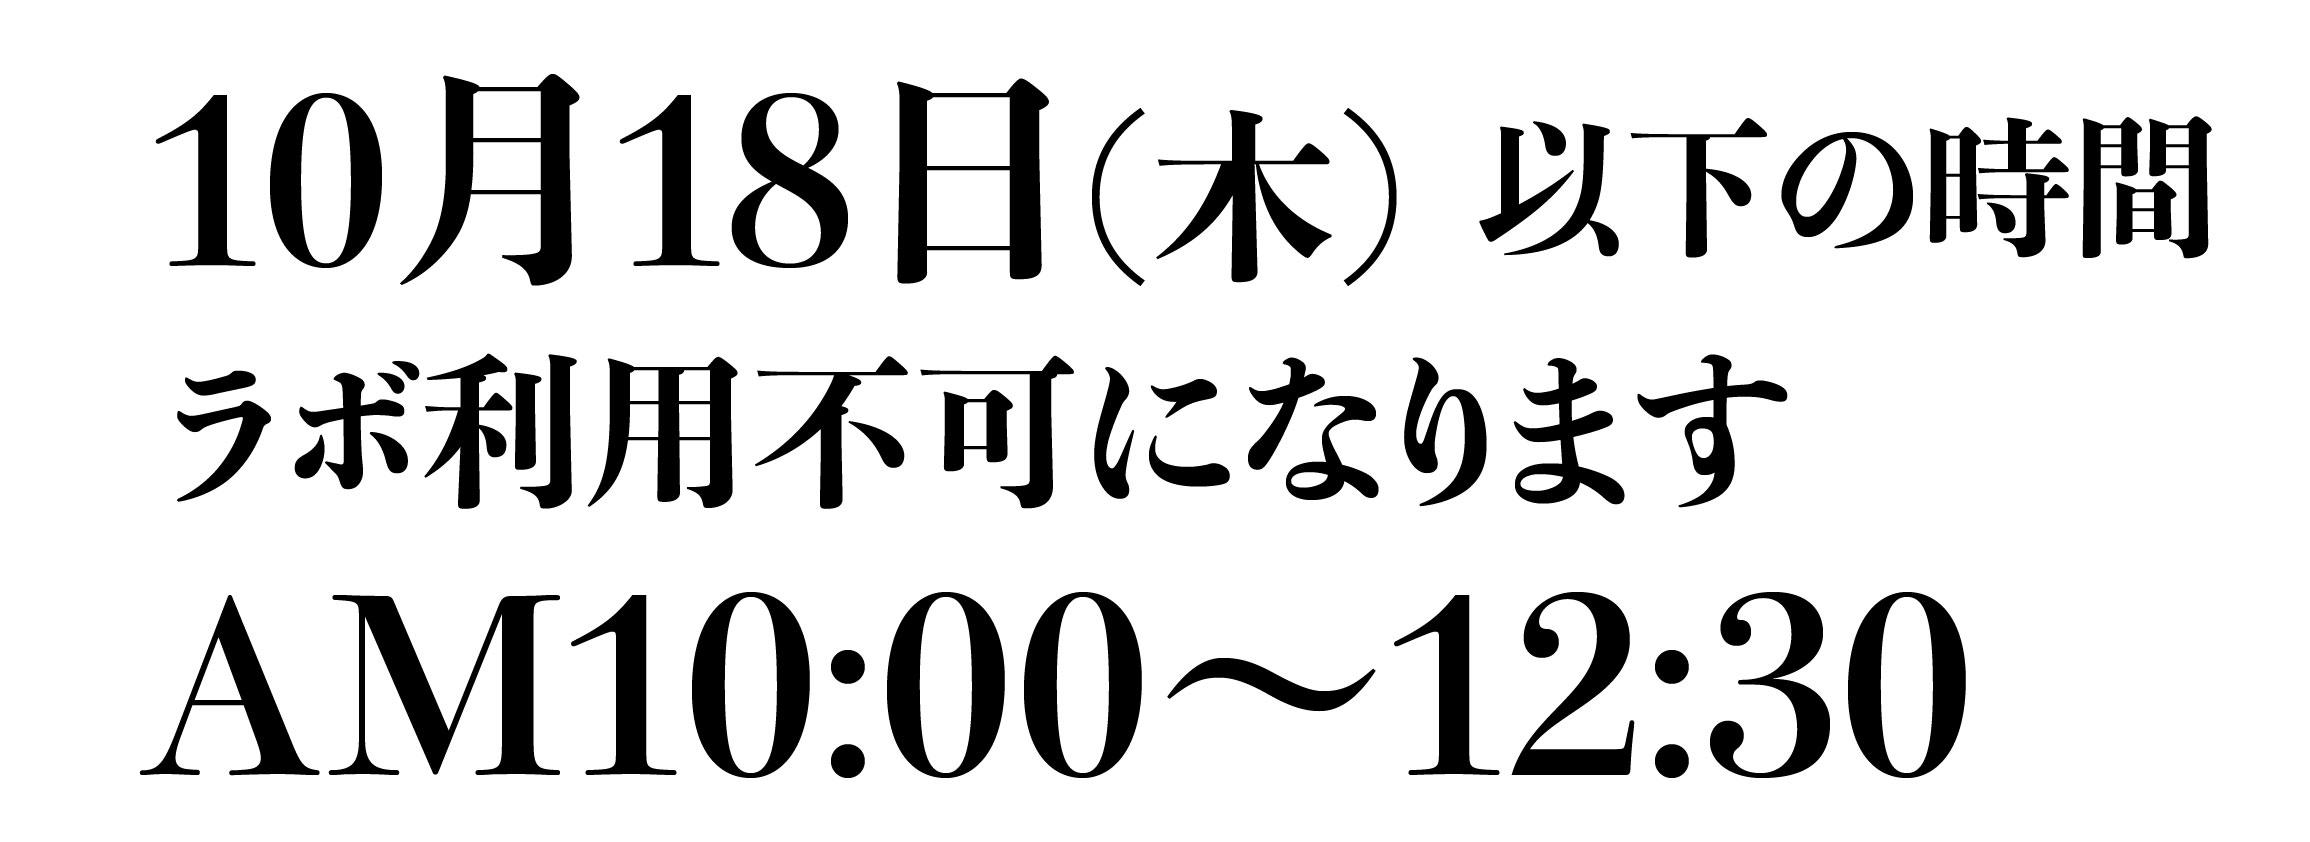 2018.10.15LAB使用禁止時間